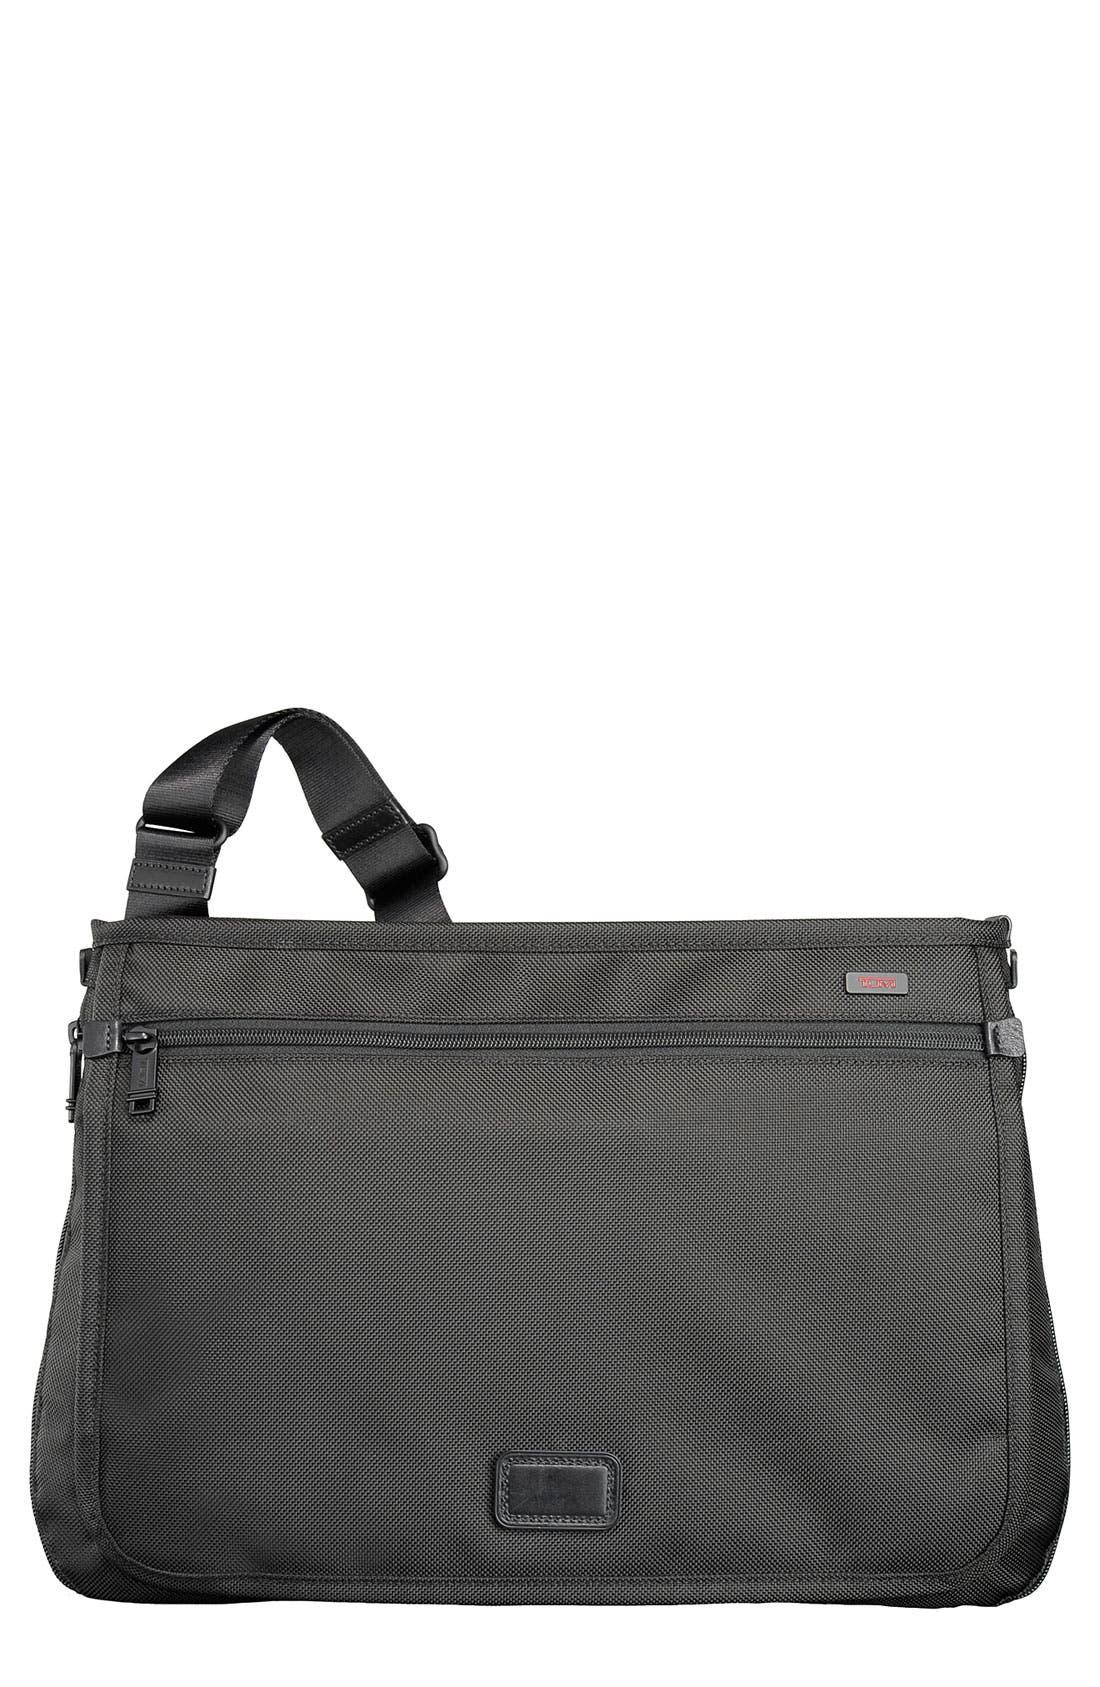 Main Image - Tumi 'Alpha' Slim Messenger Bag